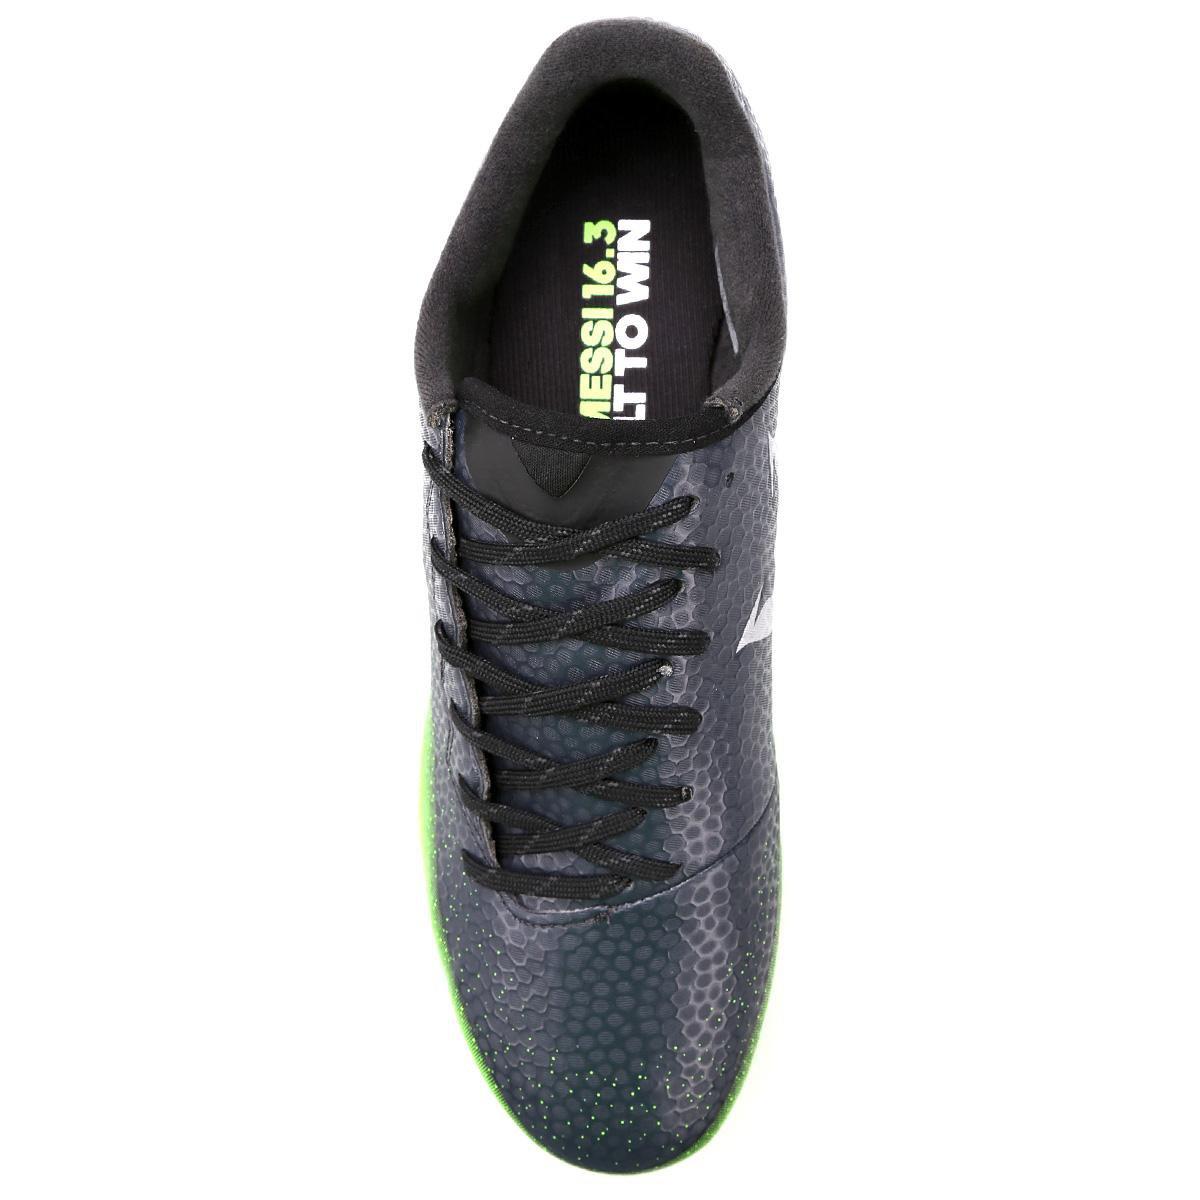 Chuteira Campo Adidas Messi 16.3 FG Masculina - Chumbo e Verde Limão ... 74e49fe7d5dba